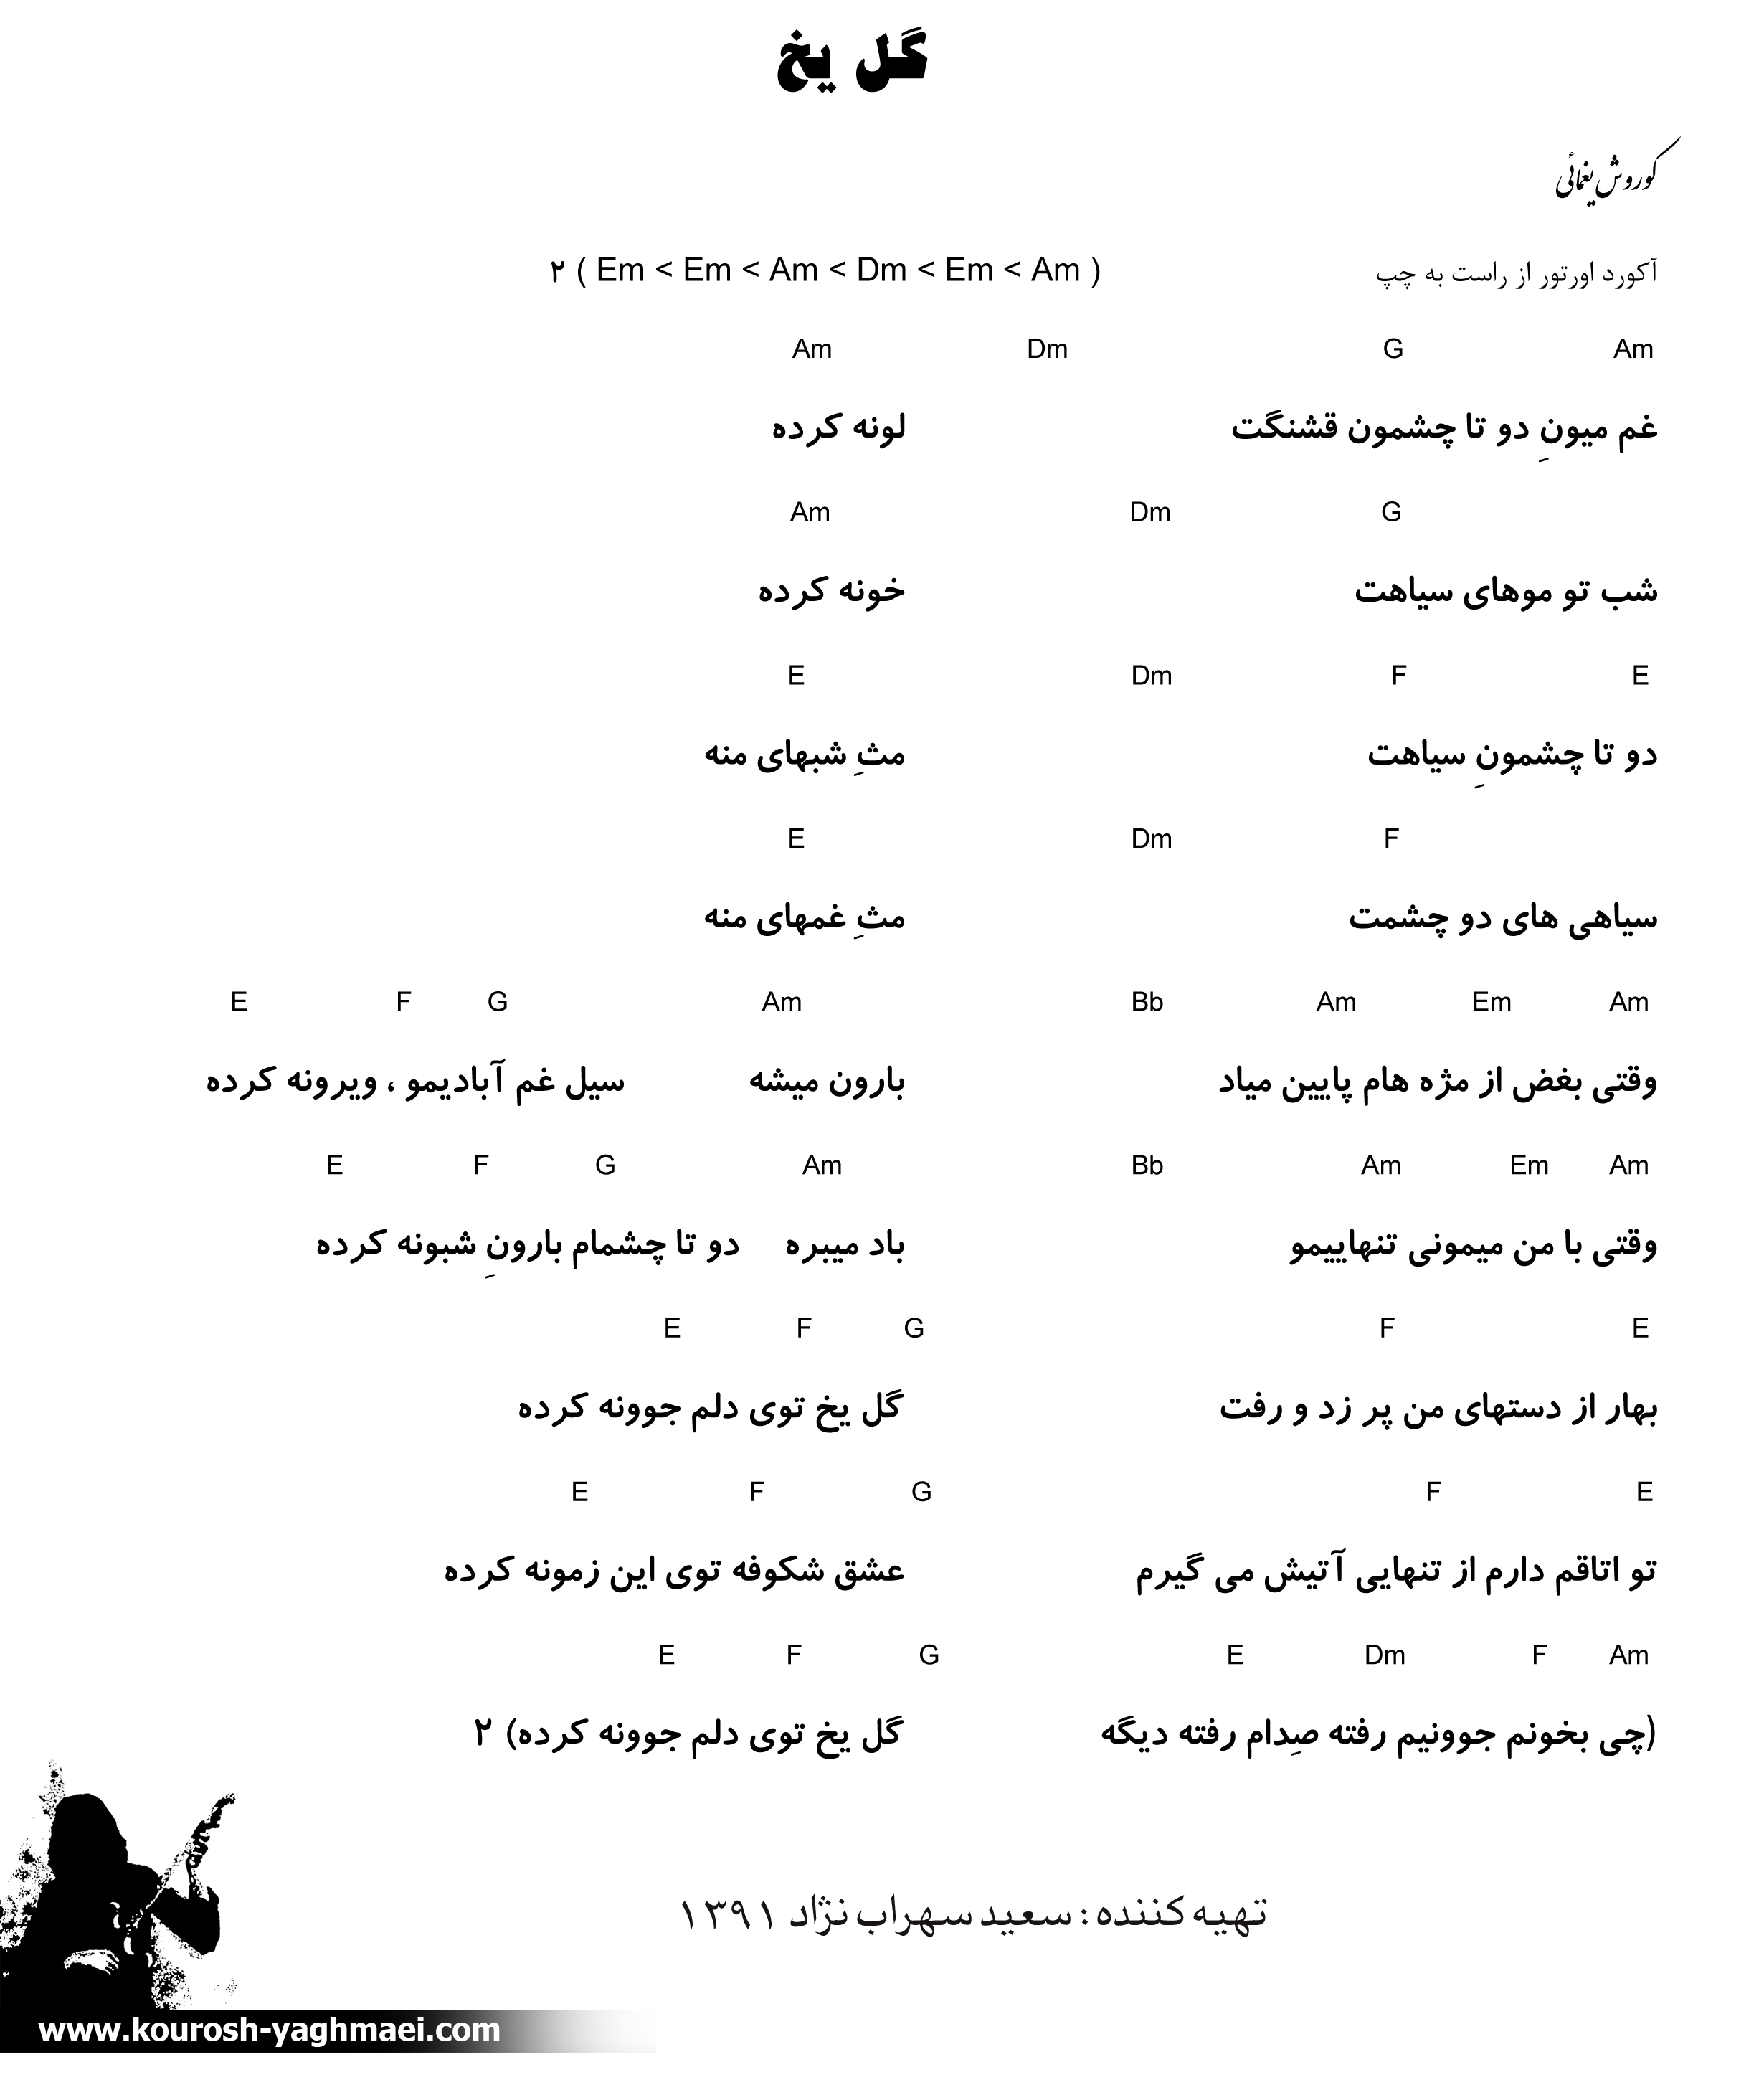 http://www.kourosh-yaghmaei.com/news/GoleYakh-Chords.jpg